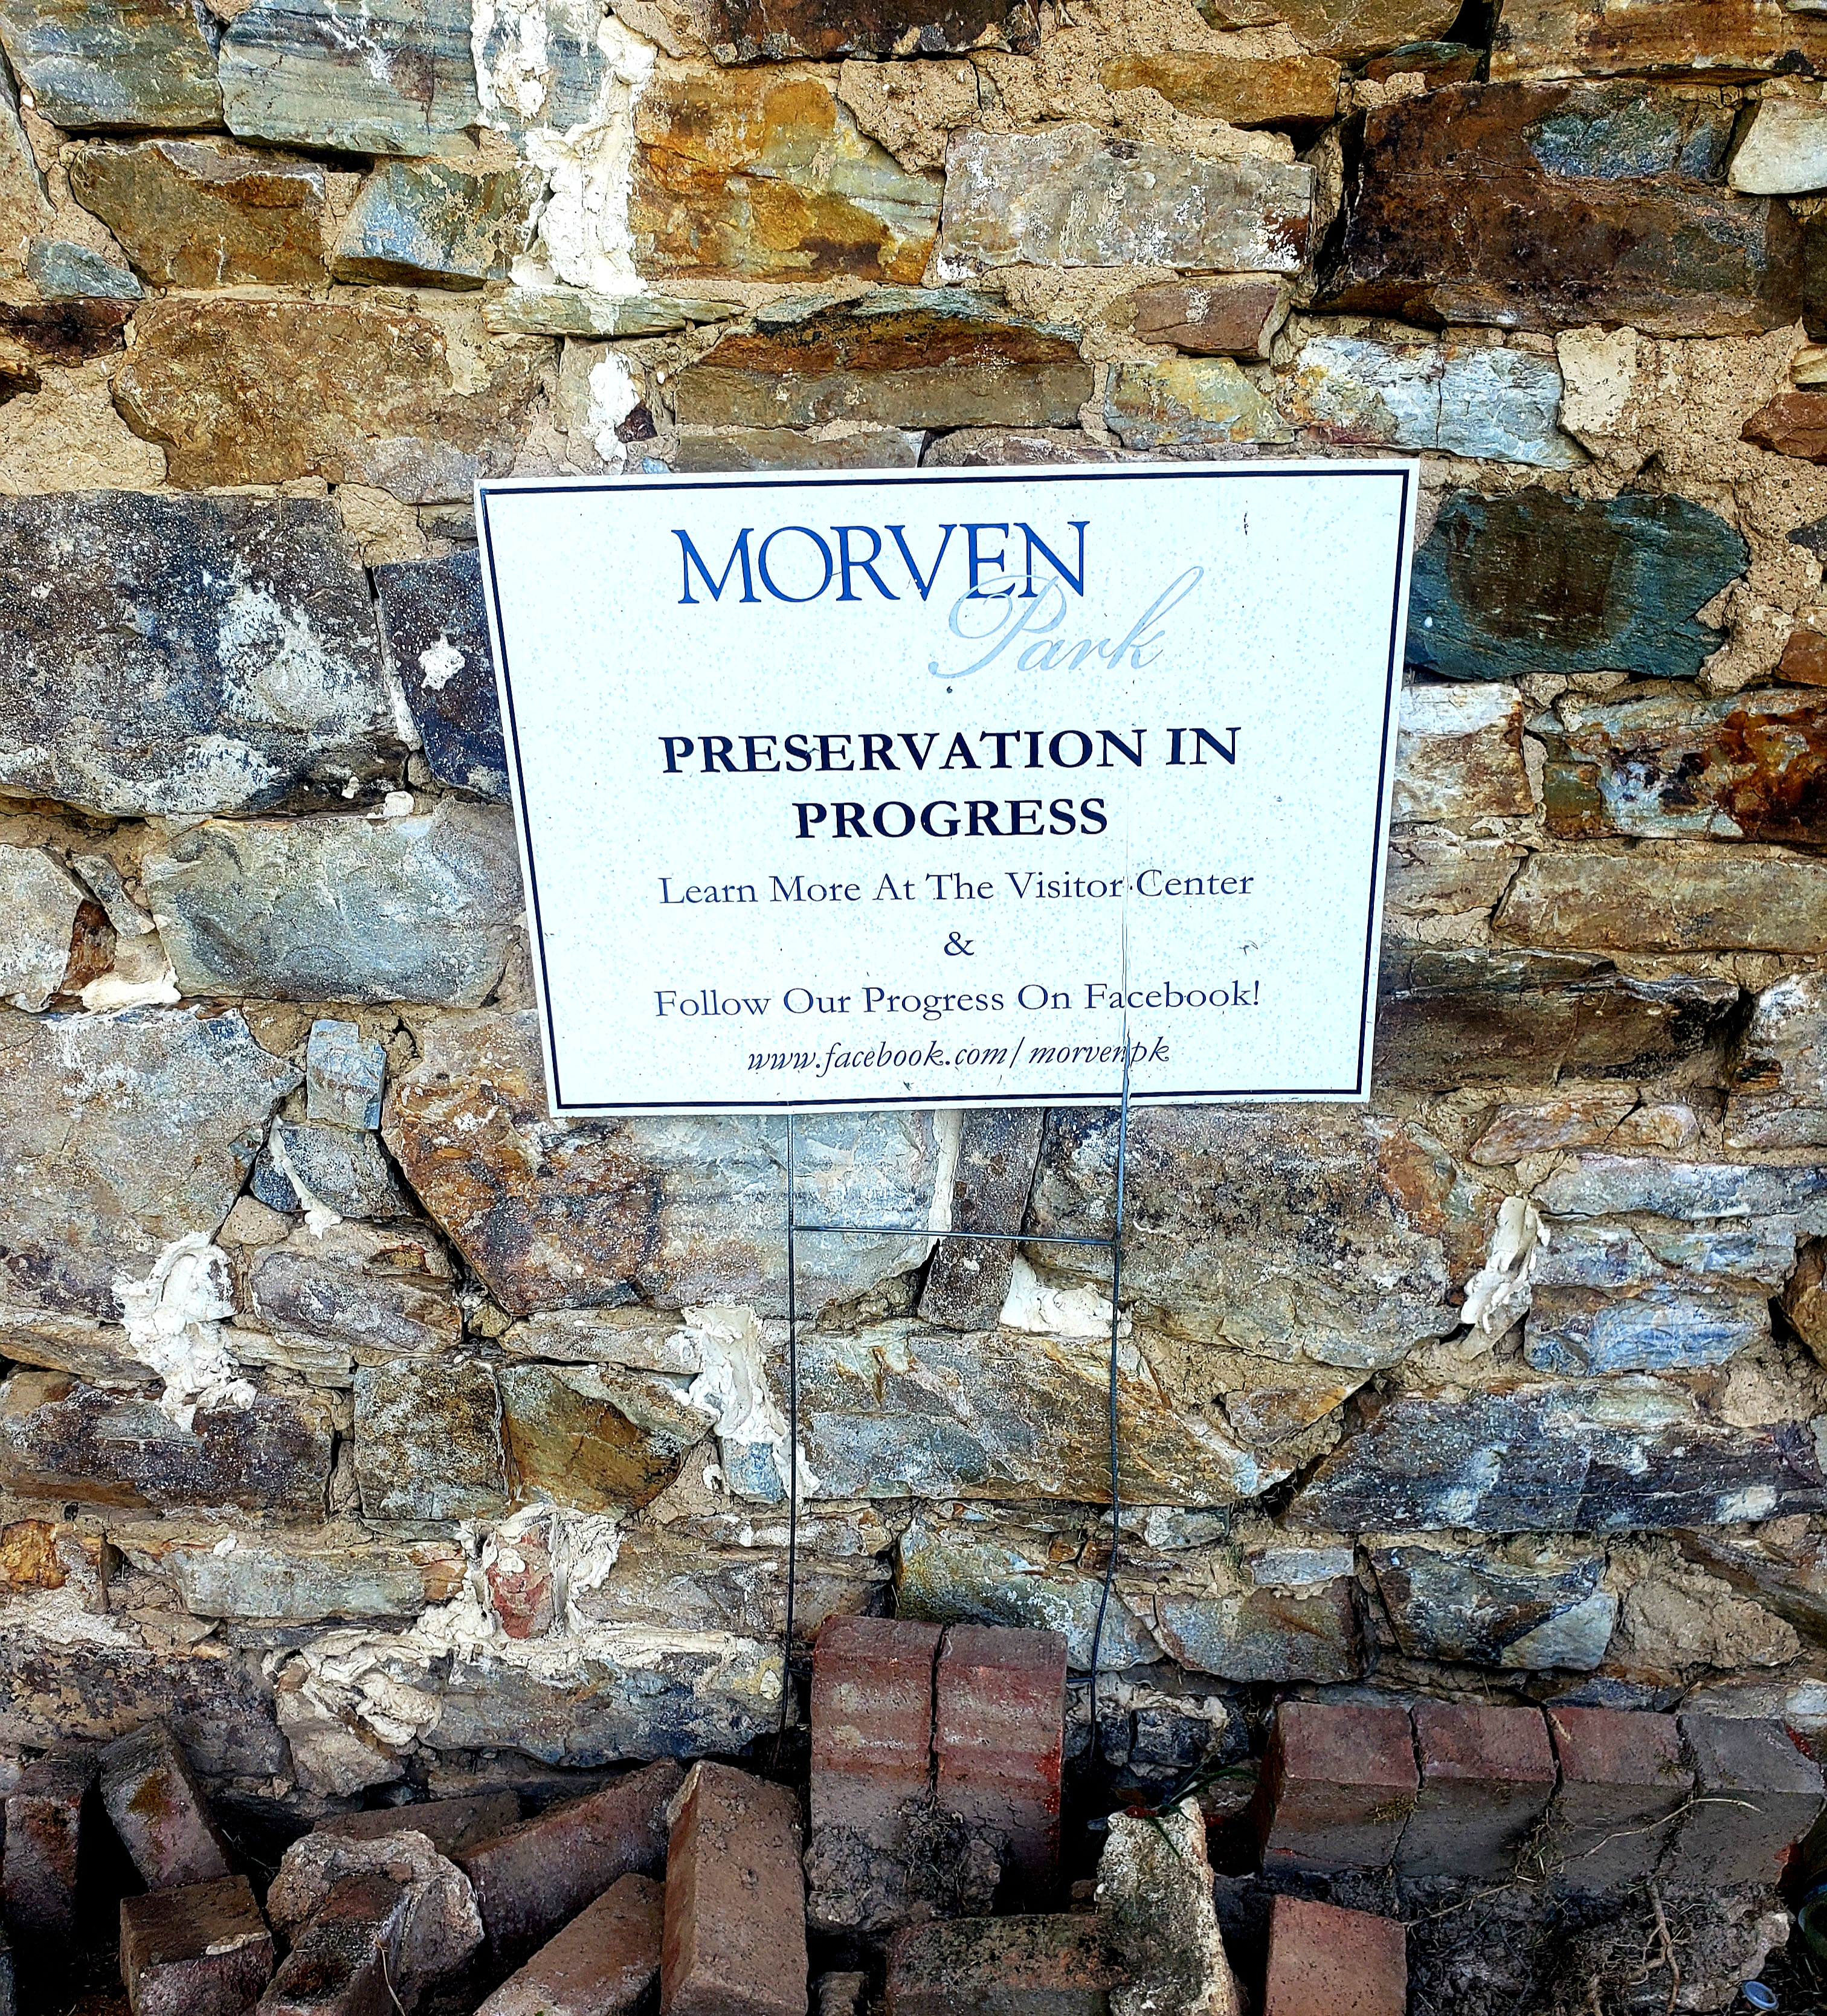 Archaeology at Morven Park